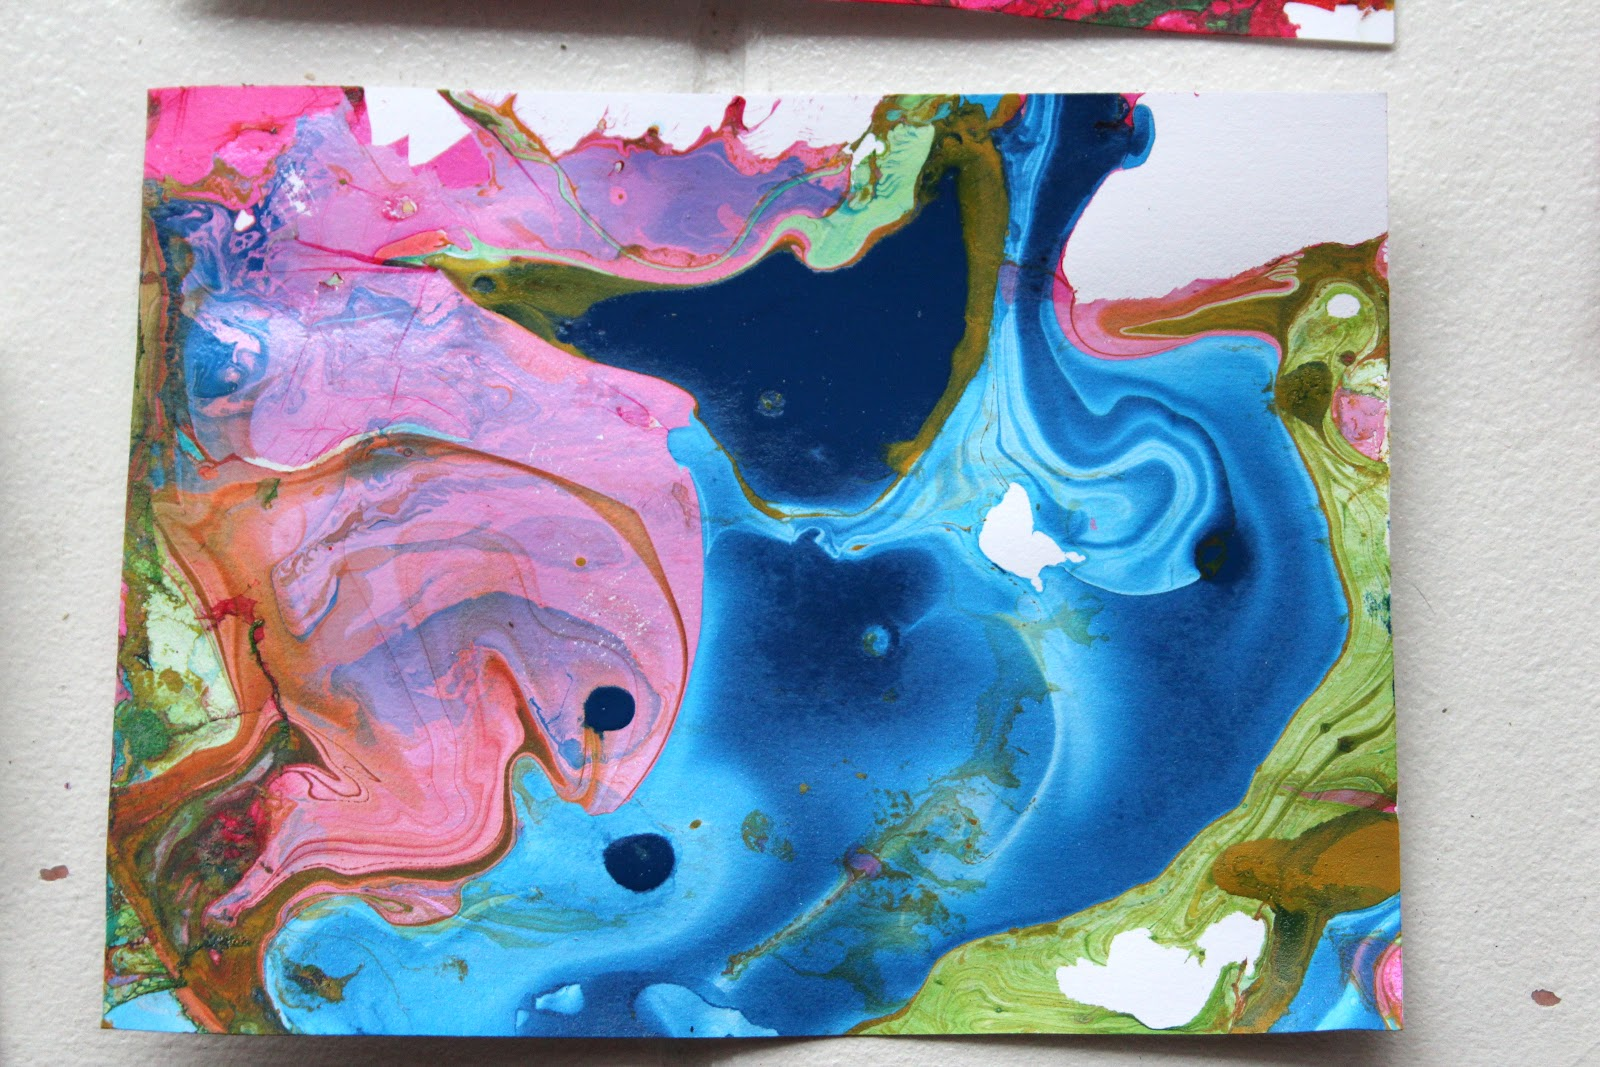 Enamel Paint For Canvas Bing Images